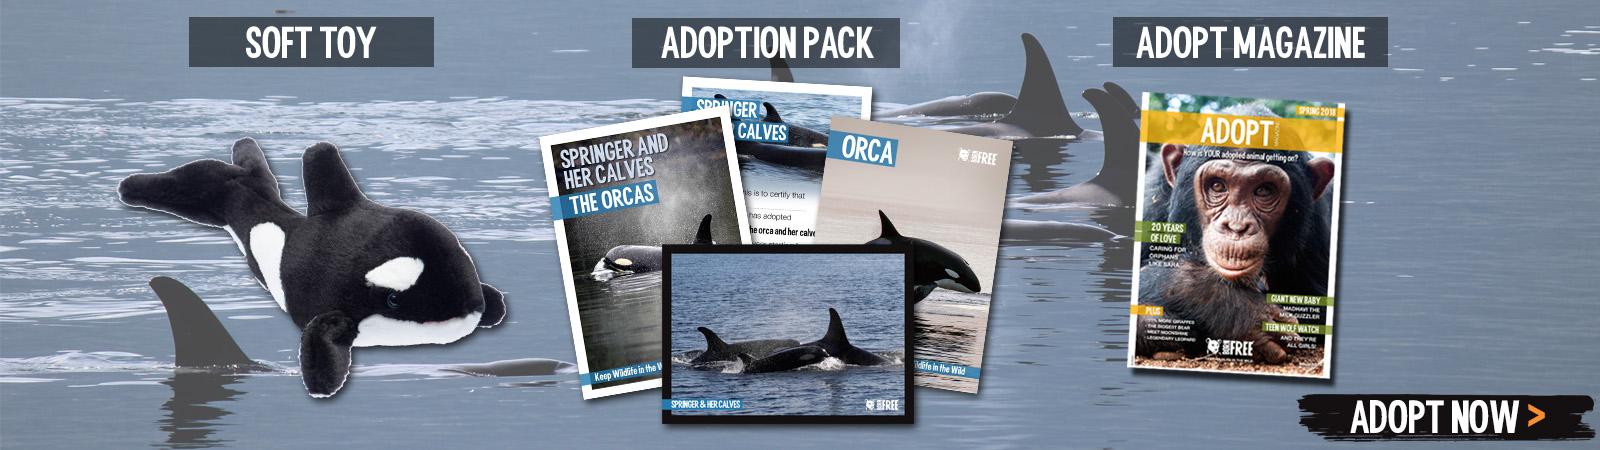 Sponsor a Orca